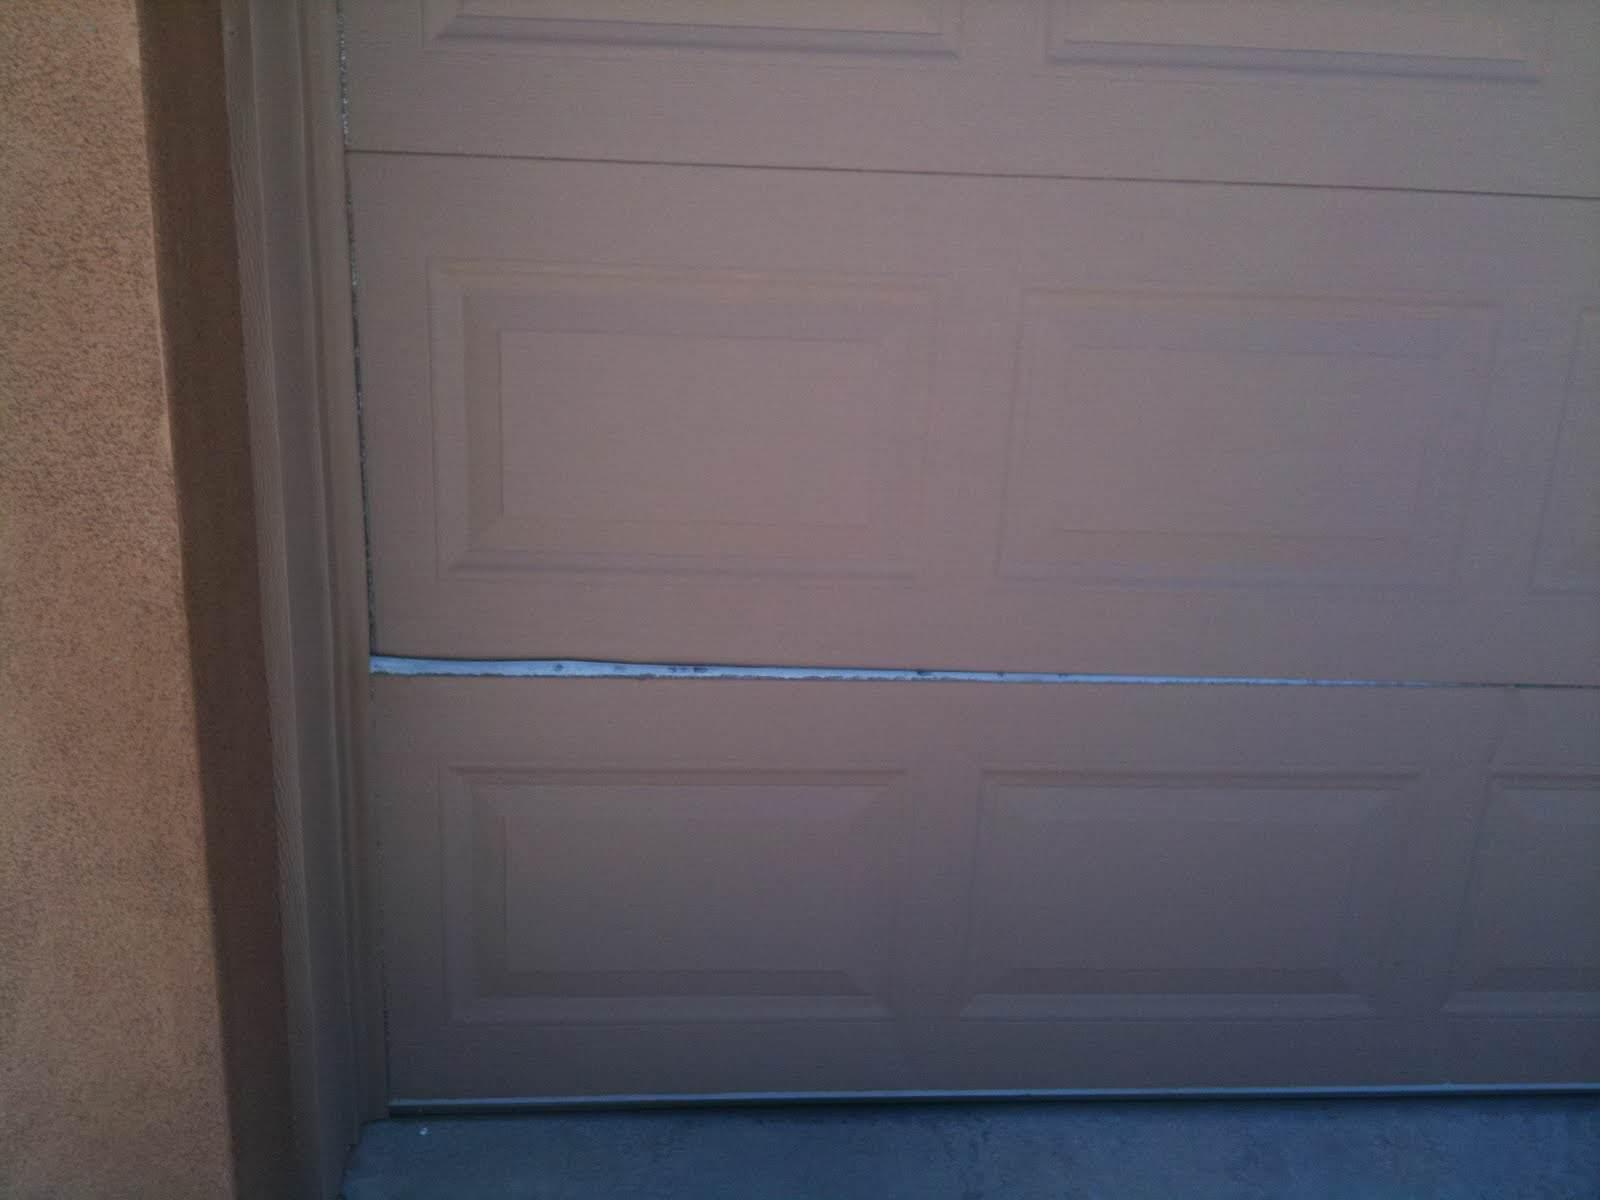 Garage door installation and automatic opener basic for Automatic garage door company minneapolis